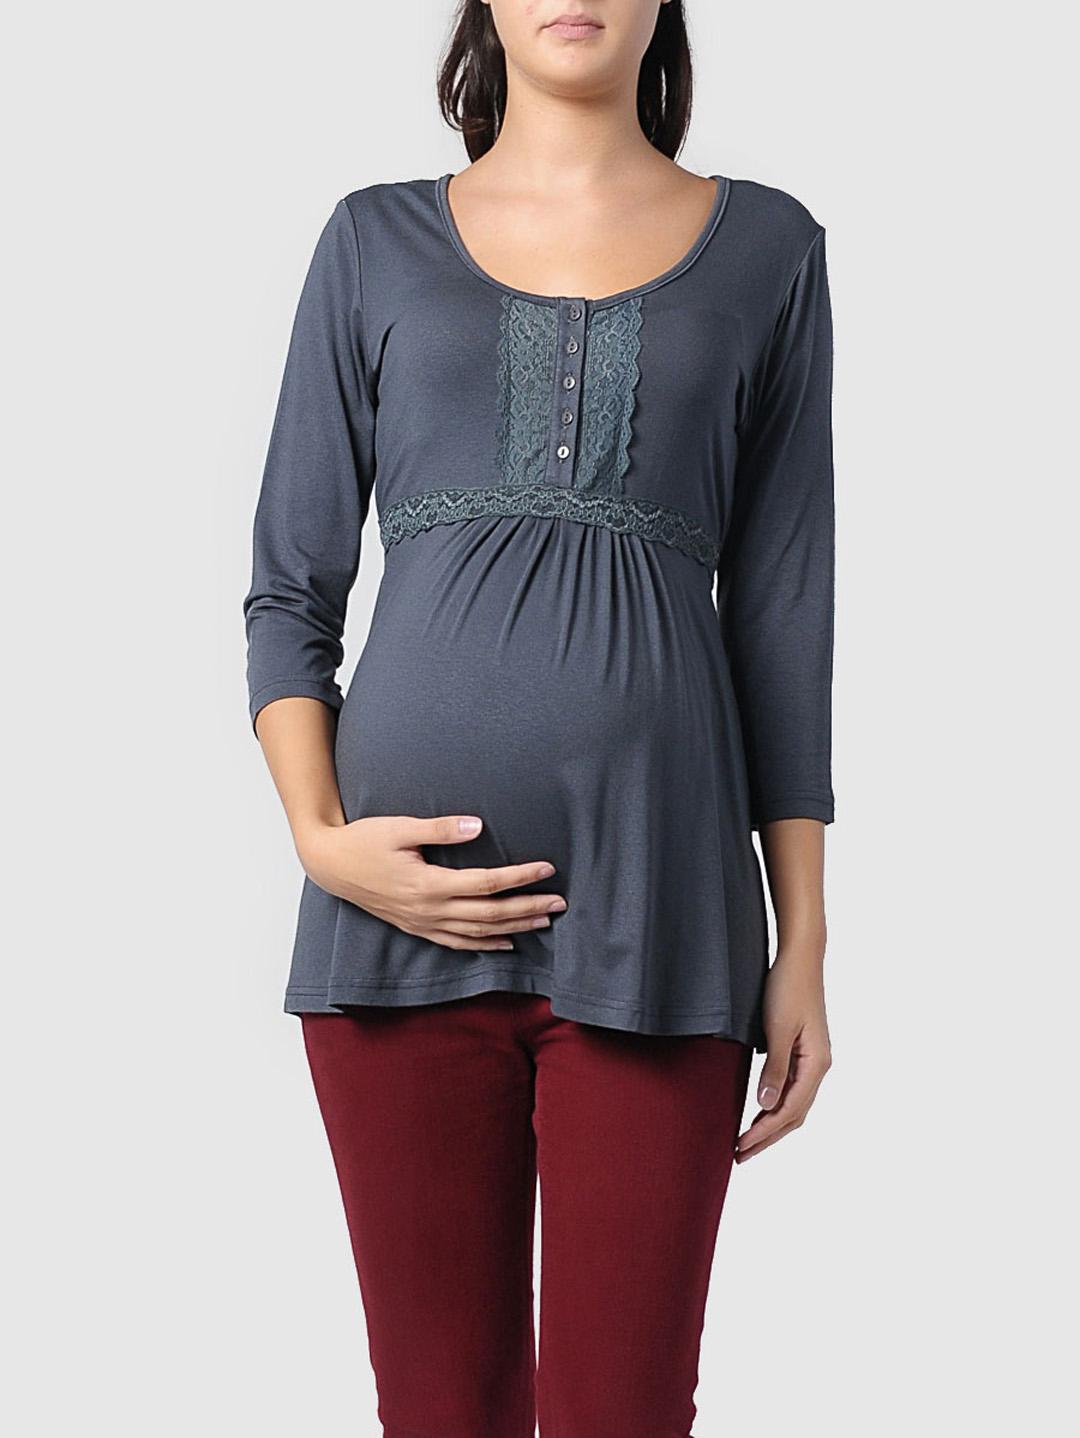 Maternity clothing fashions